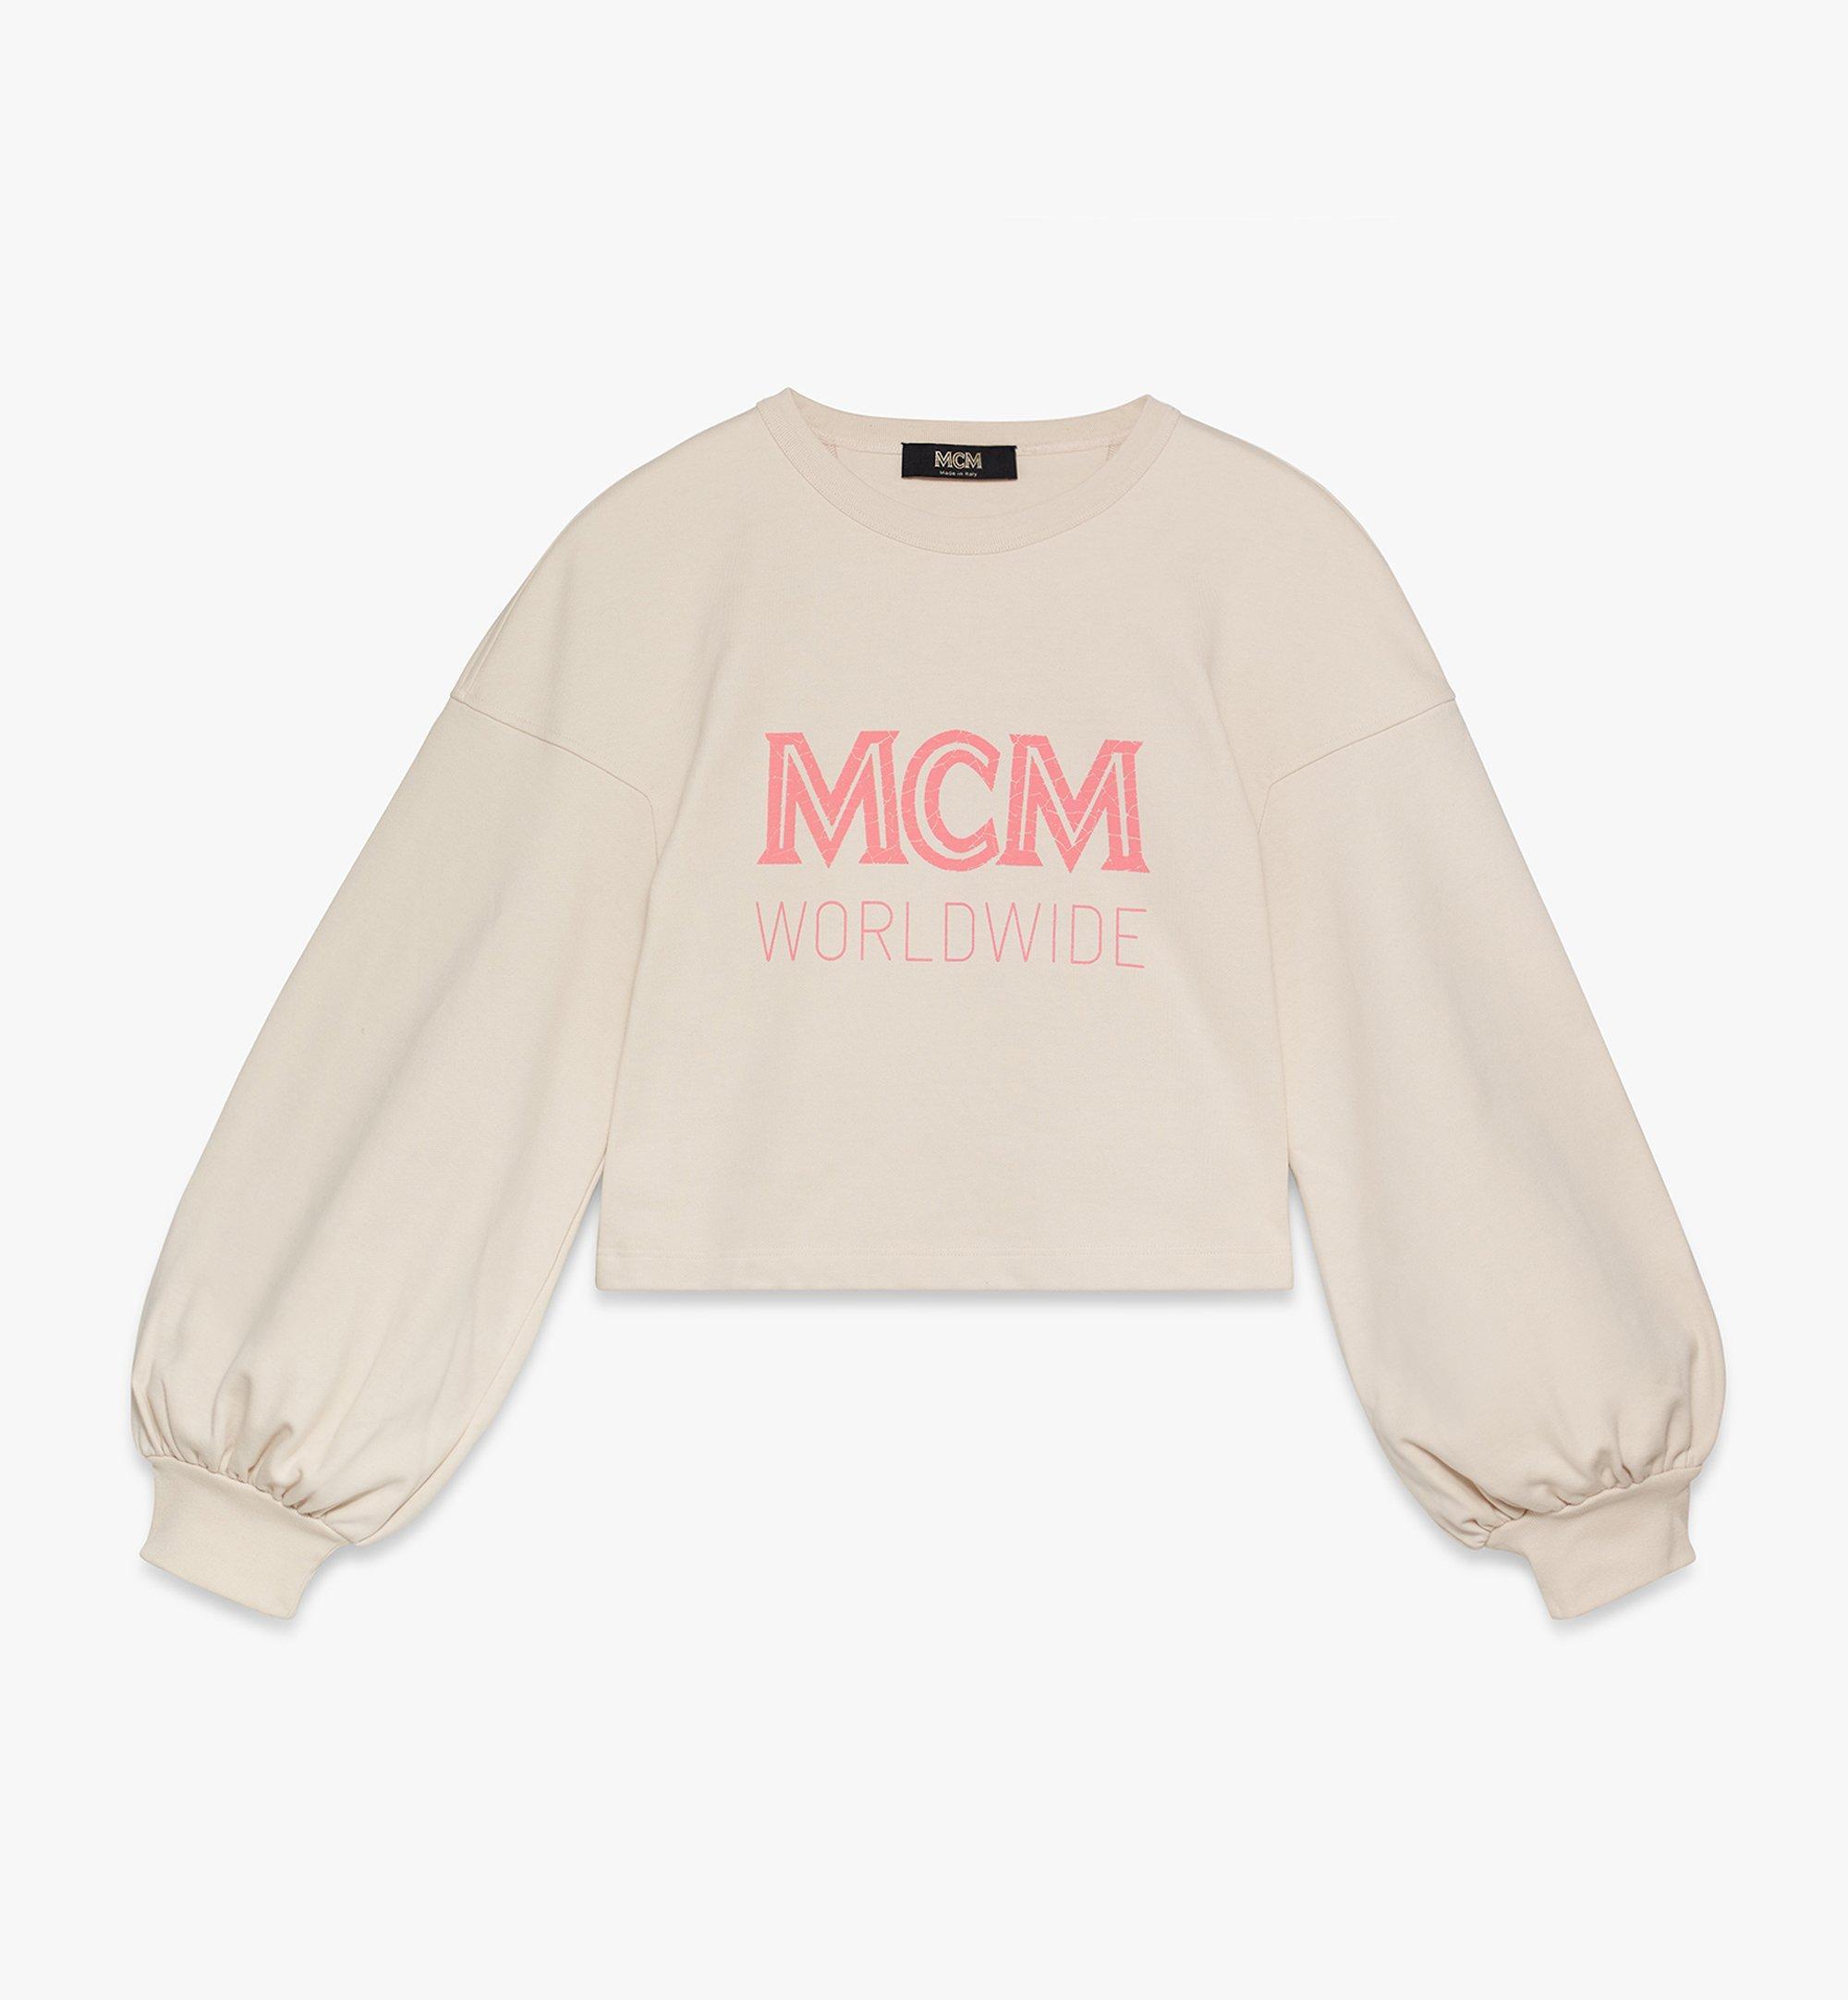 MCM Women's MCM Worldwide Sweatshirt Beige MFAASMM03IH00M Alternate View 1